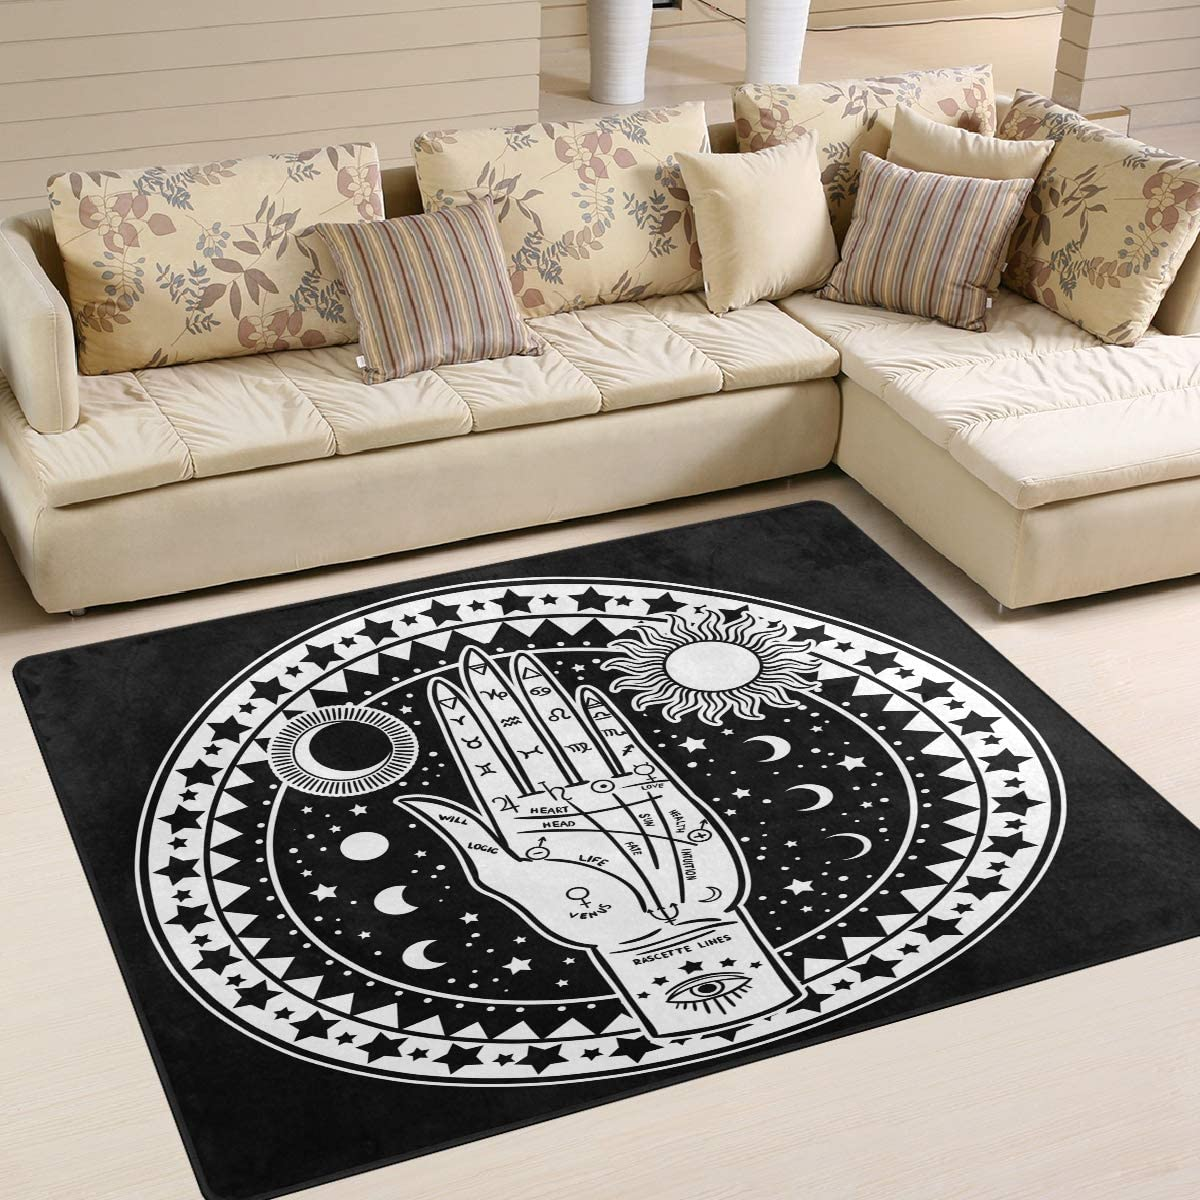 AGONA Tarot Sun and Max 87% OFF Moon Ranking TOP9 Palmistry Mystical White Rug Black Area